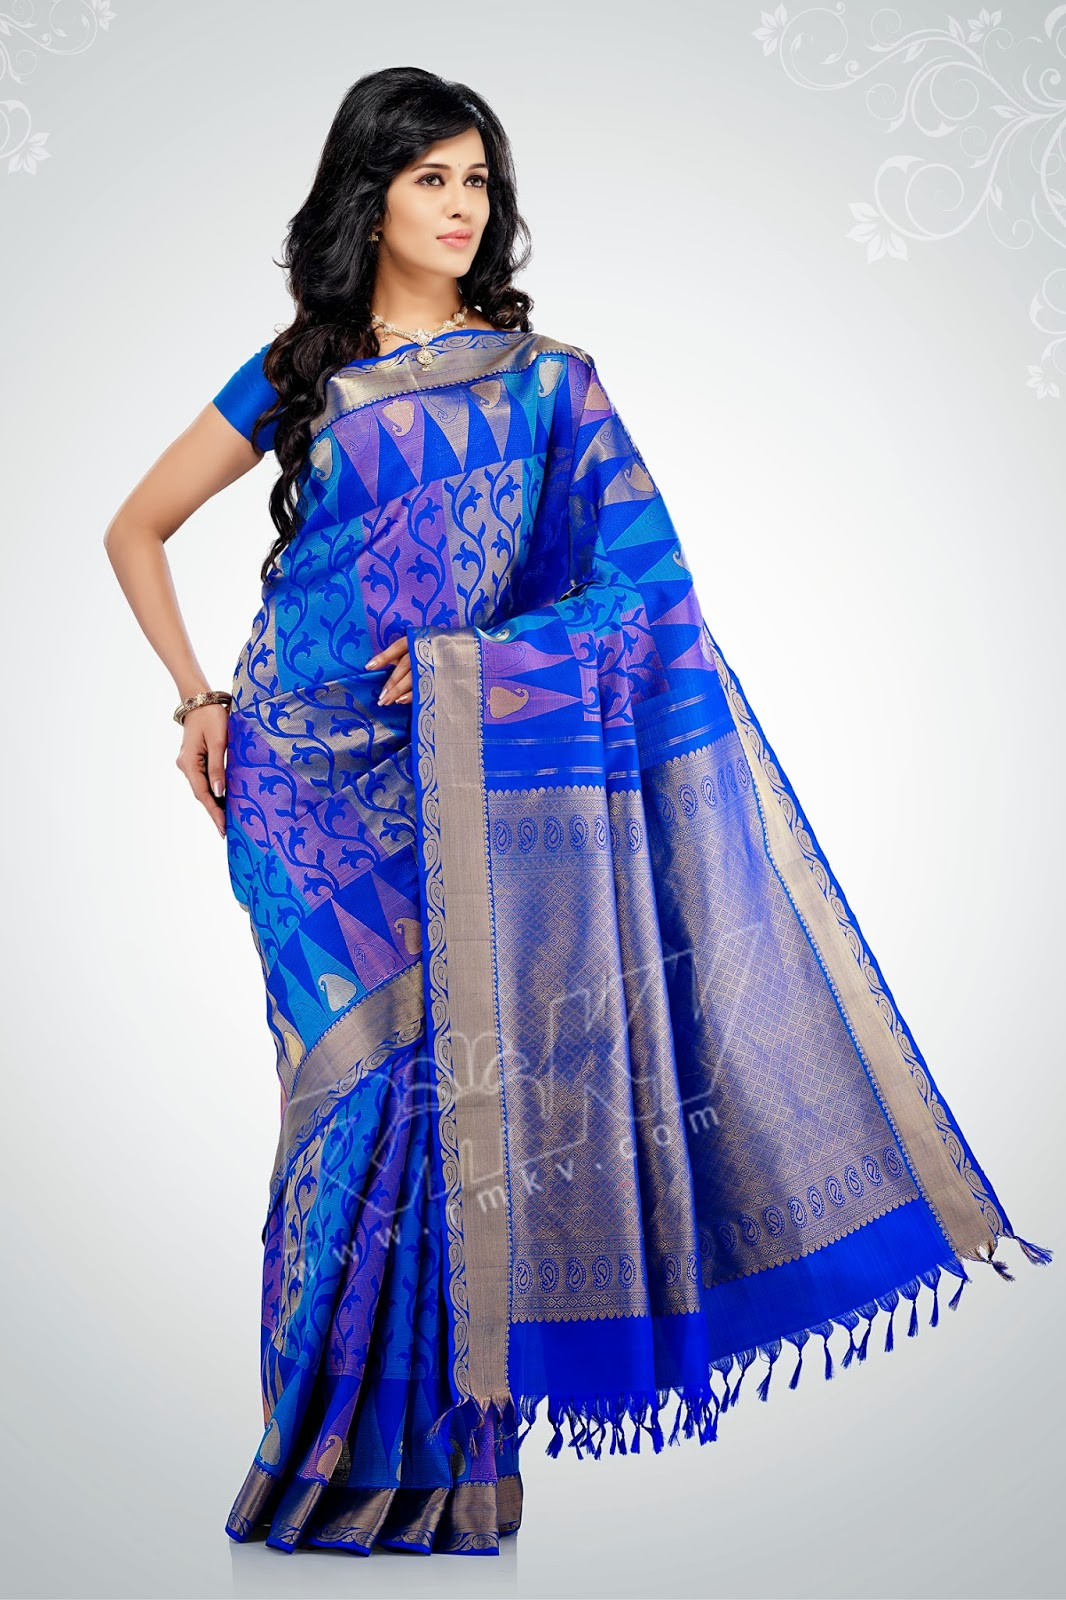 fec801209d52 Lovely look saree - RMKV WEDDING SILKS - CHENNAI Consumer Review ...